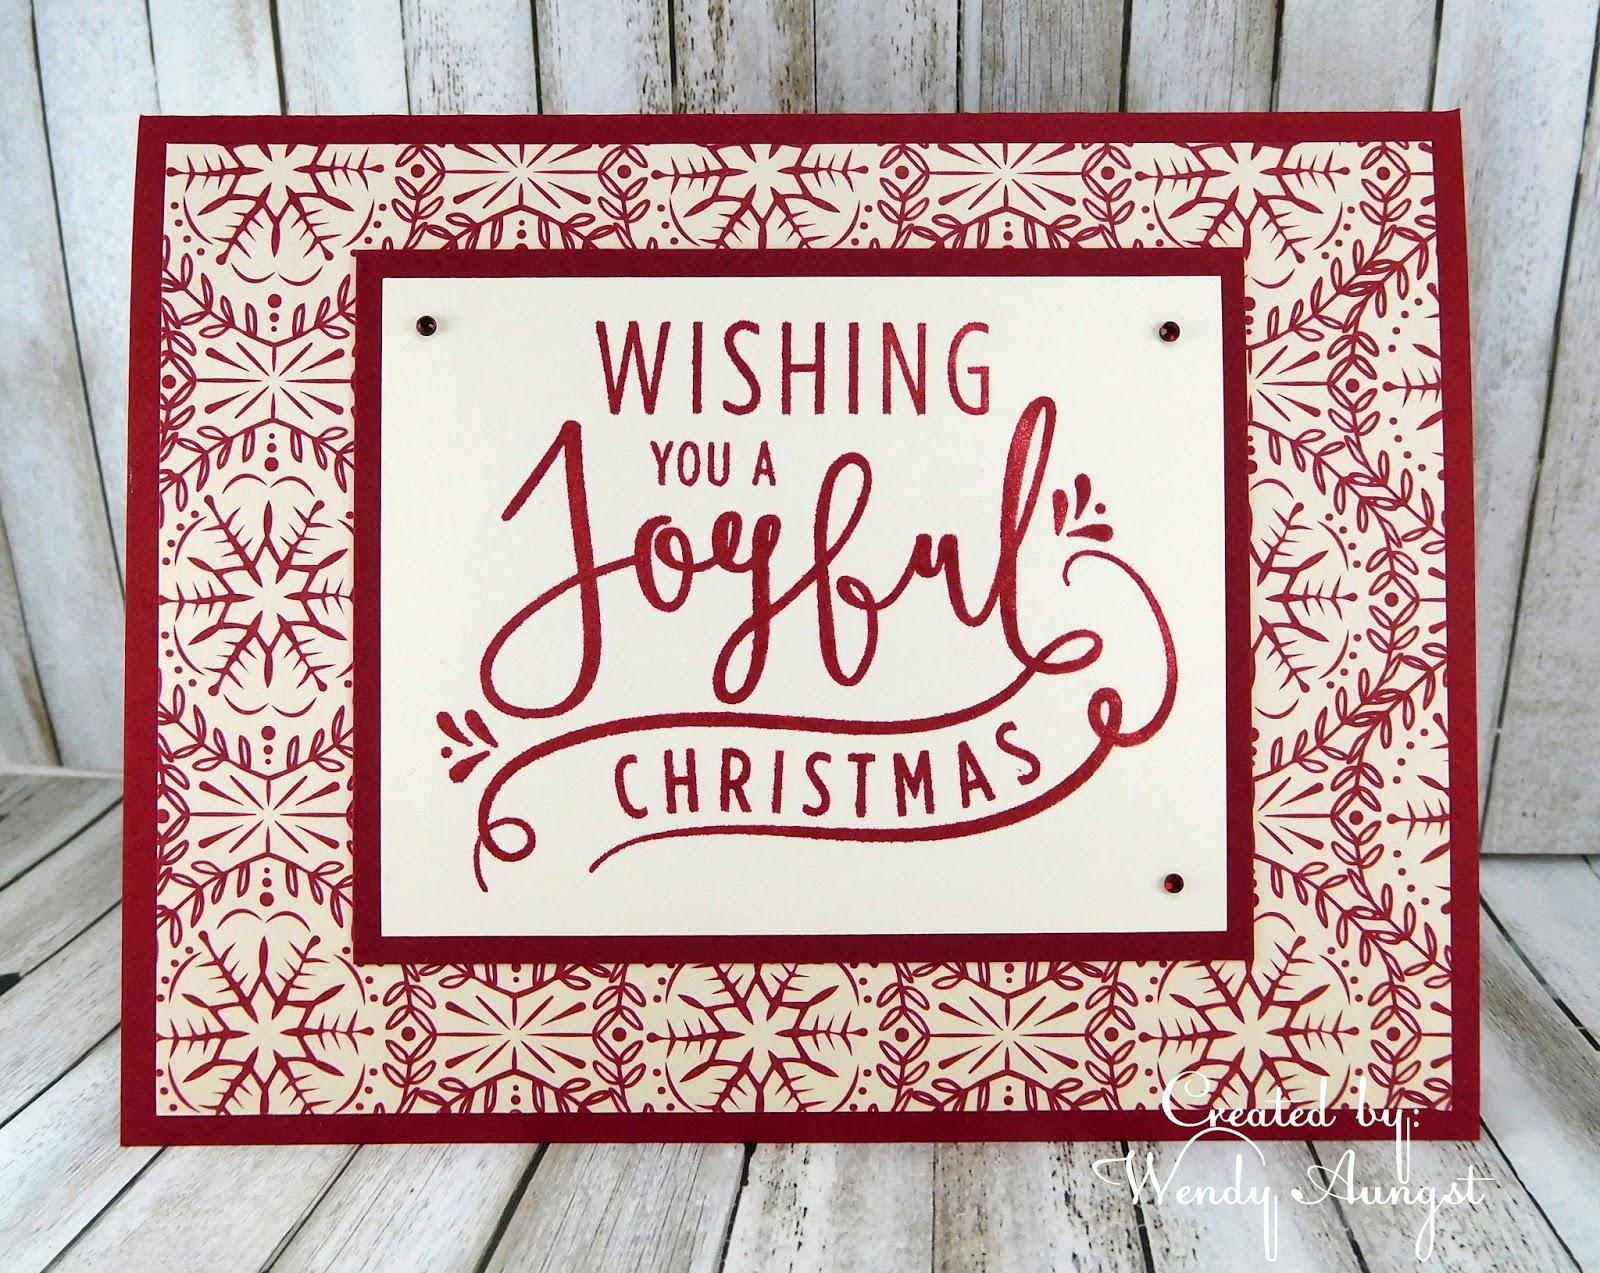 WeeBeeStampin4Fun: Have a Joyful Christmas